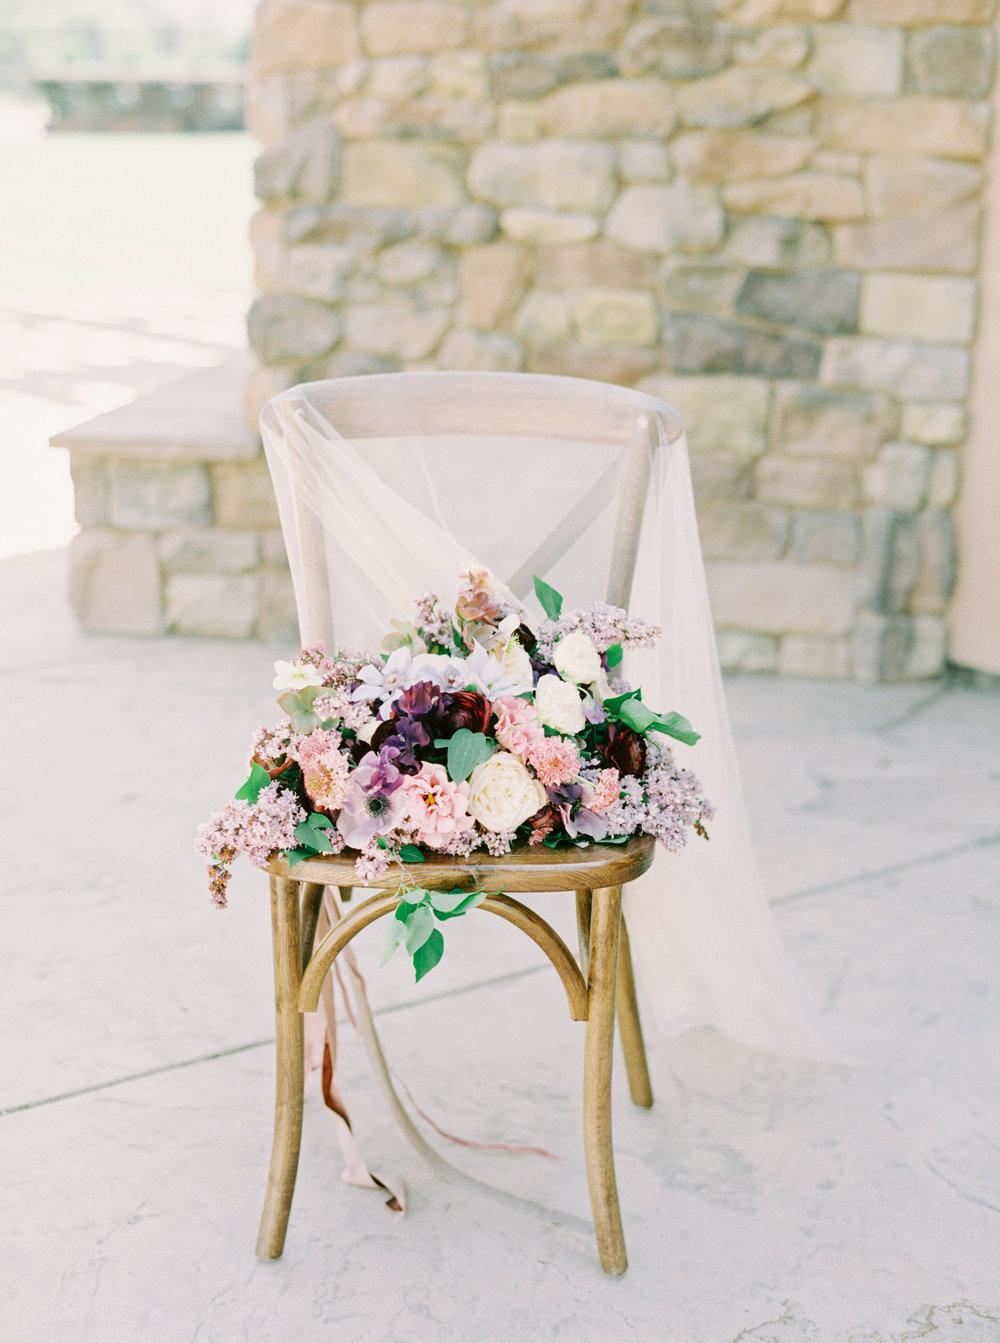 This-Love-of-Yours-Kirigin-Cellars-Flower-Arch-Styled-Shoot-043.jpg